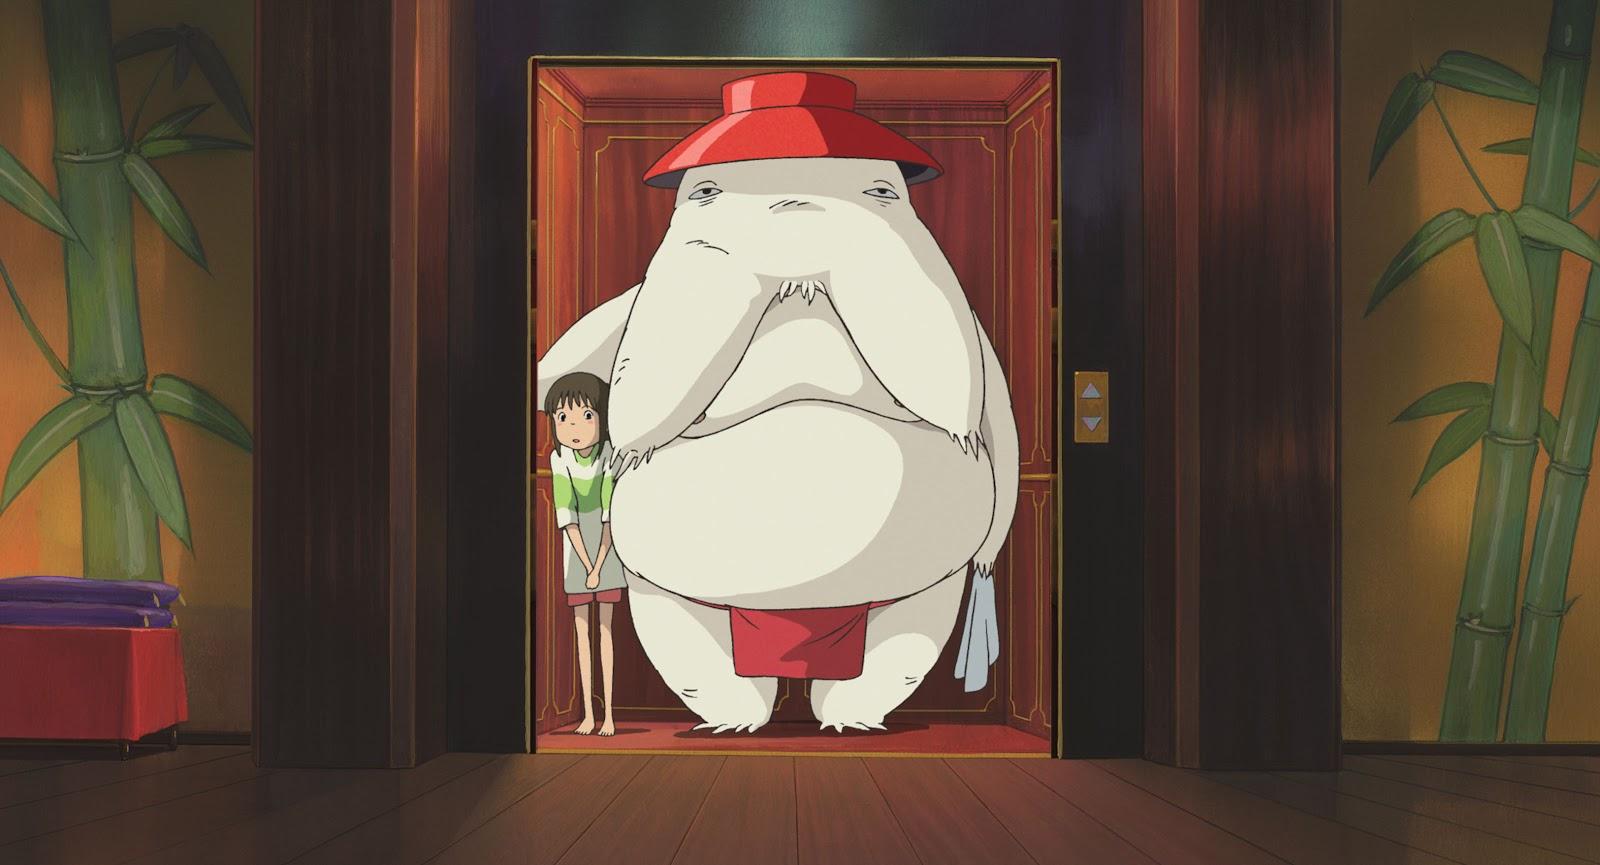 DubSub - Anime Reviews: Spirited Away Anime Movie Review